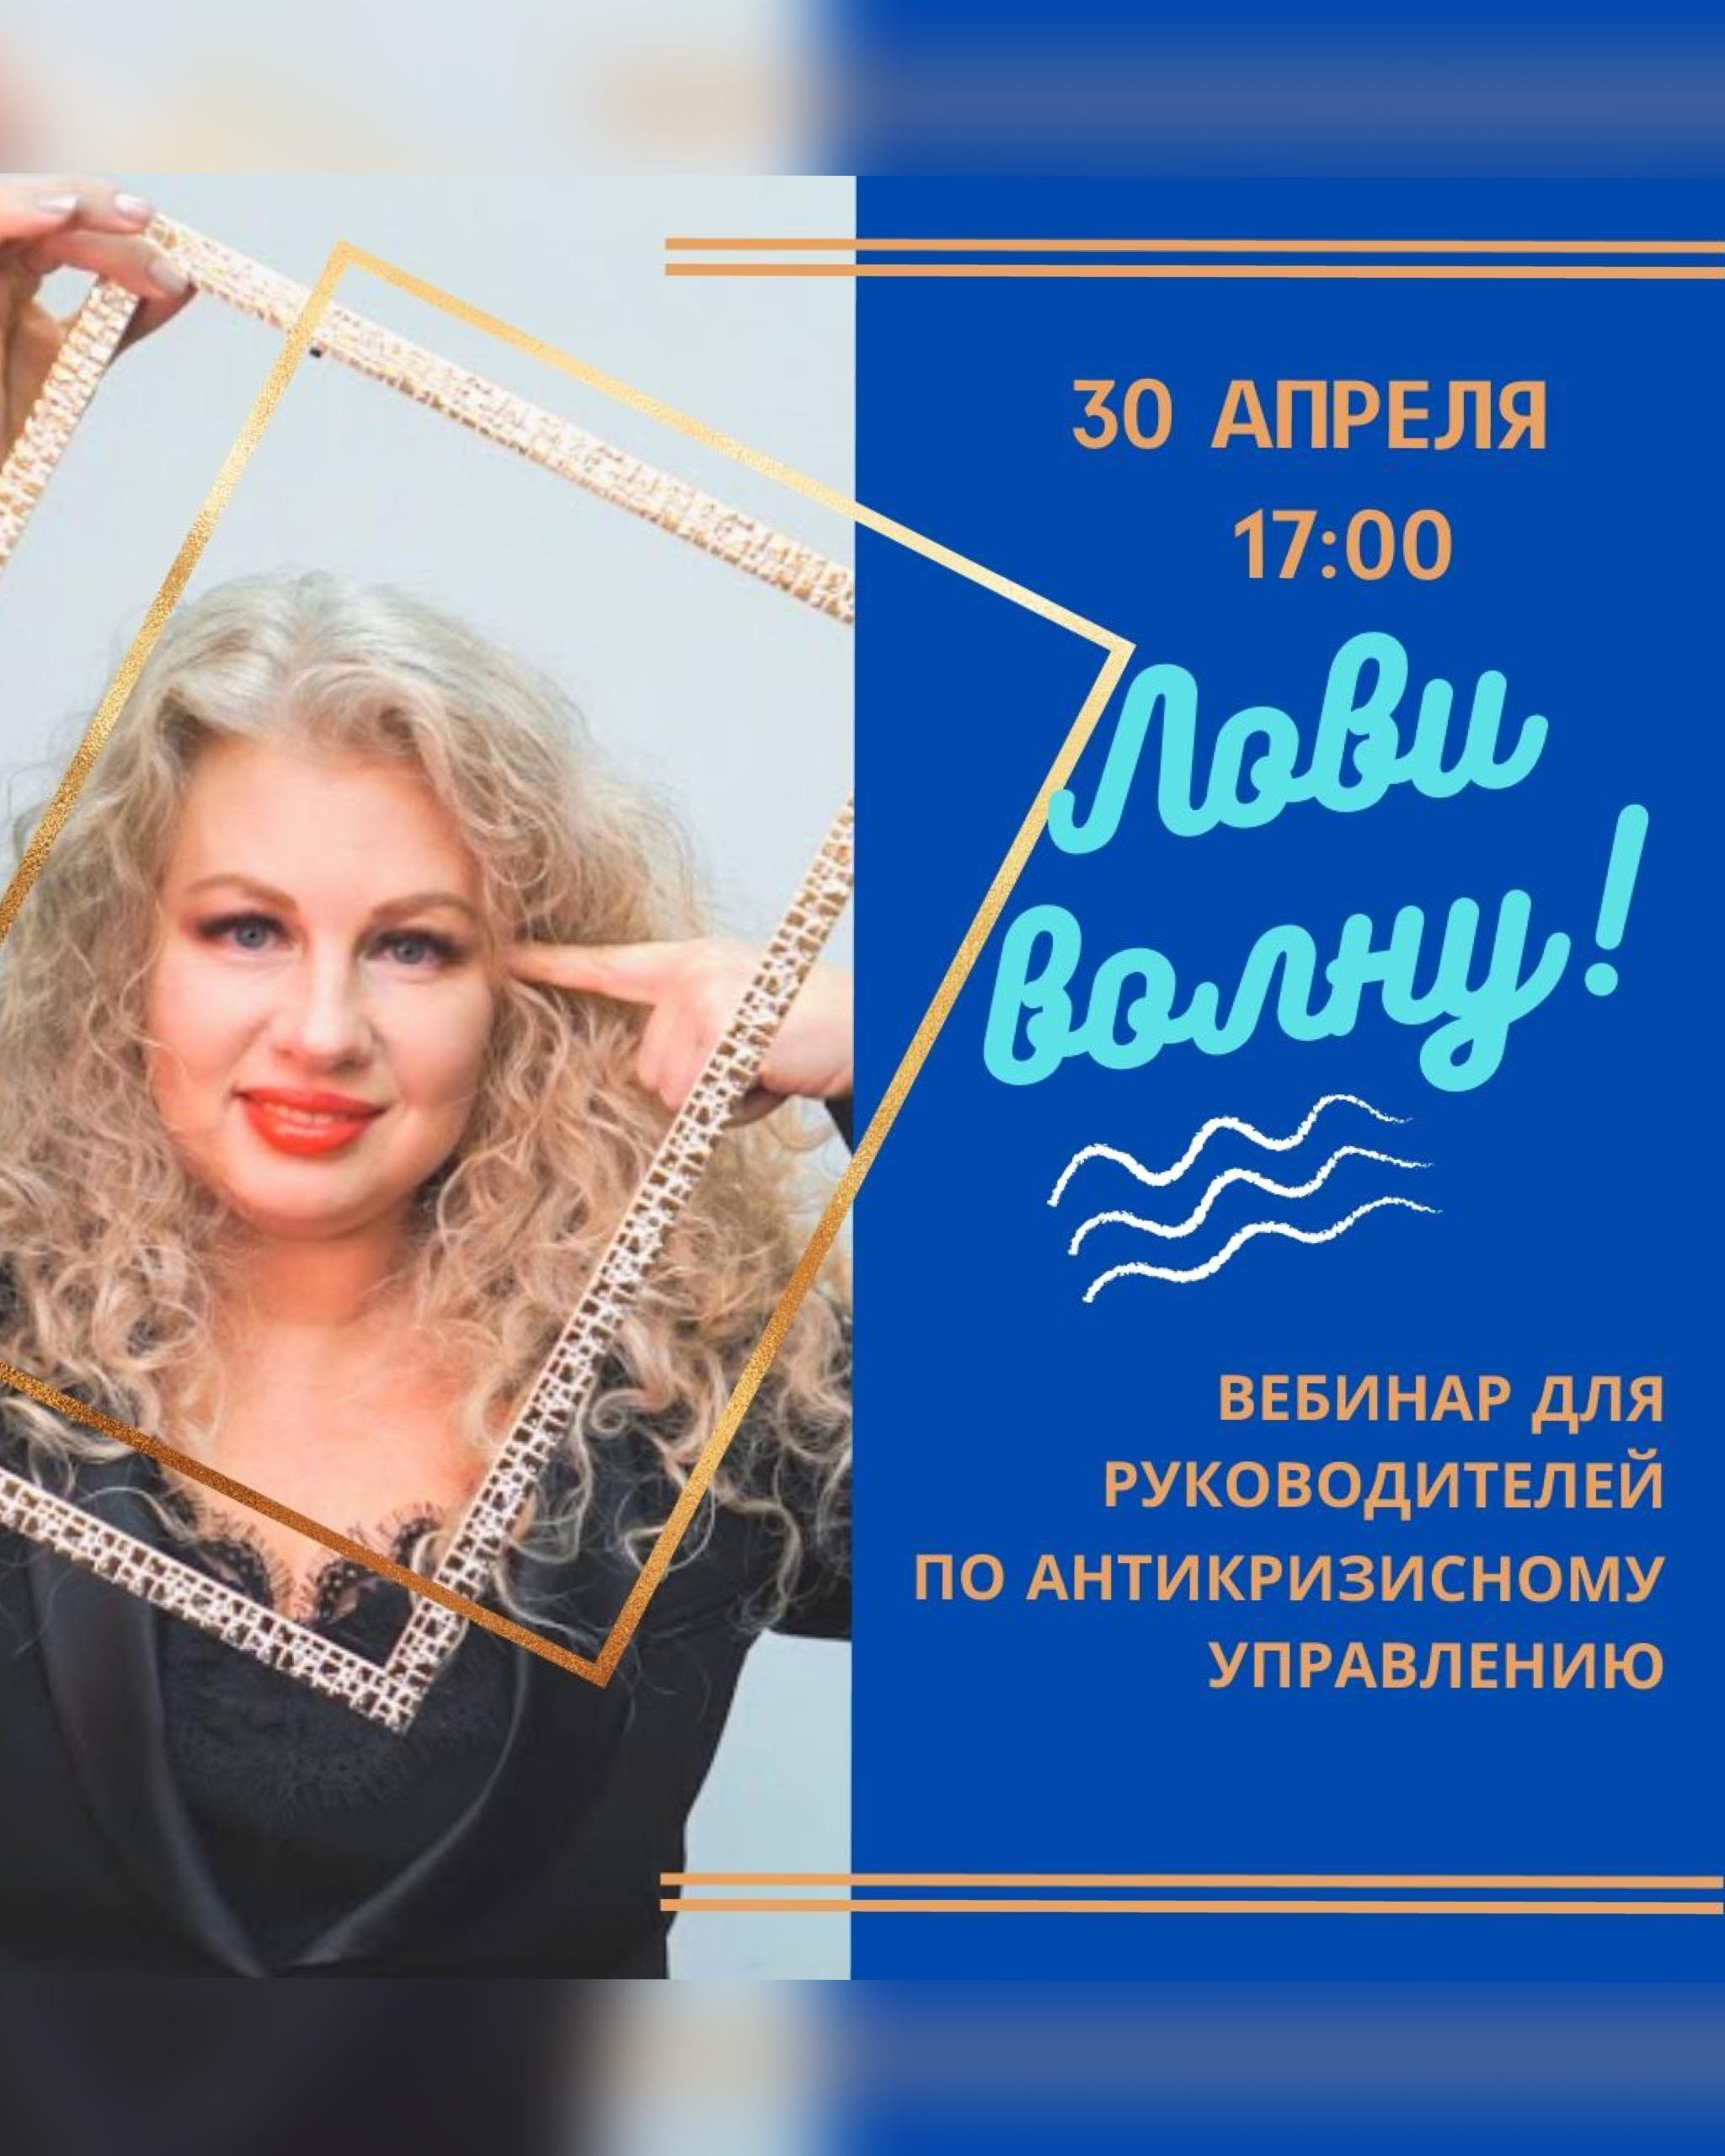 Наталья Сашкина